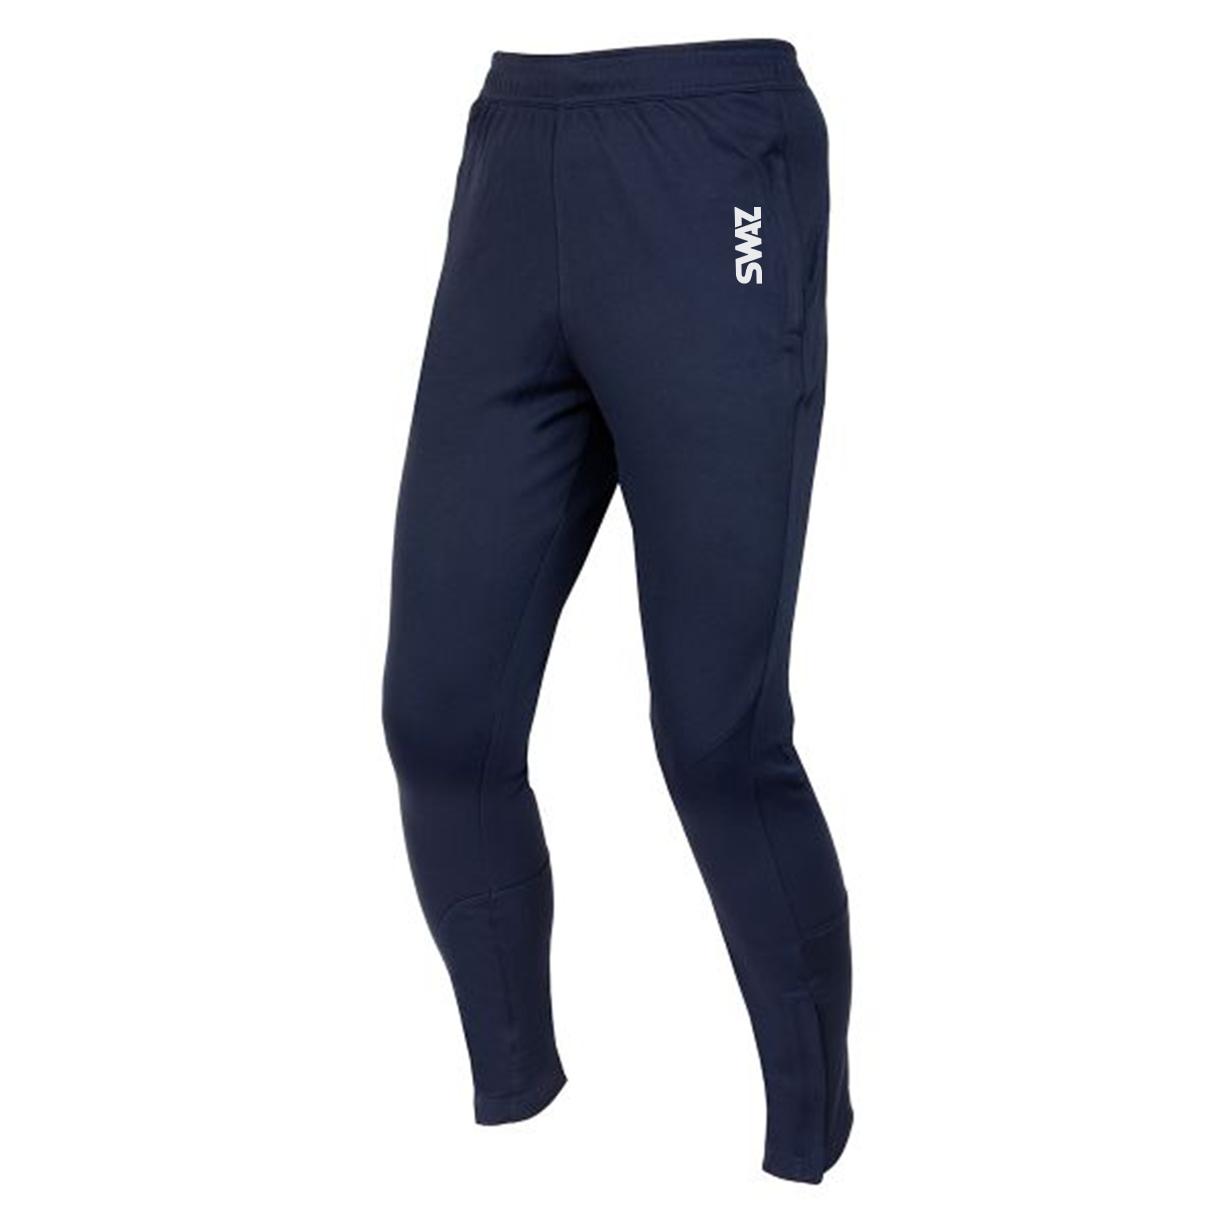 SWAZ Skinny Pants – Navy